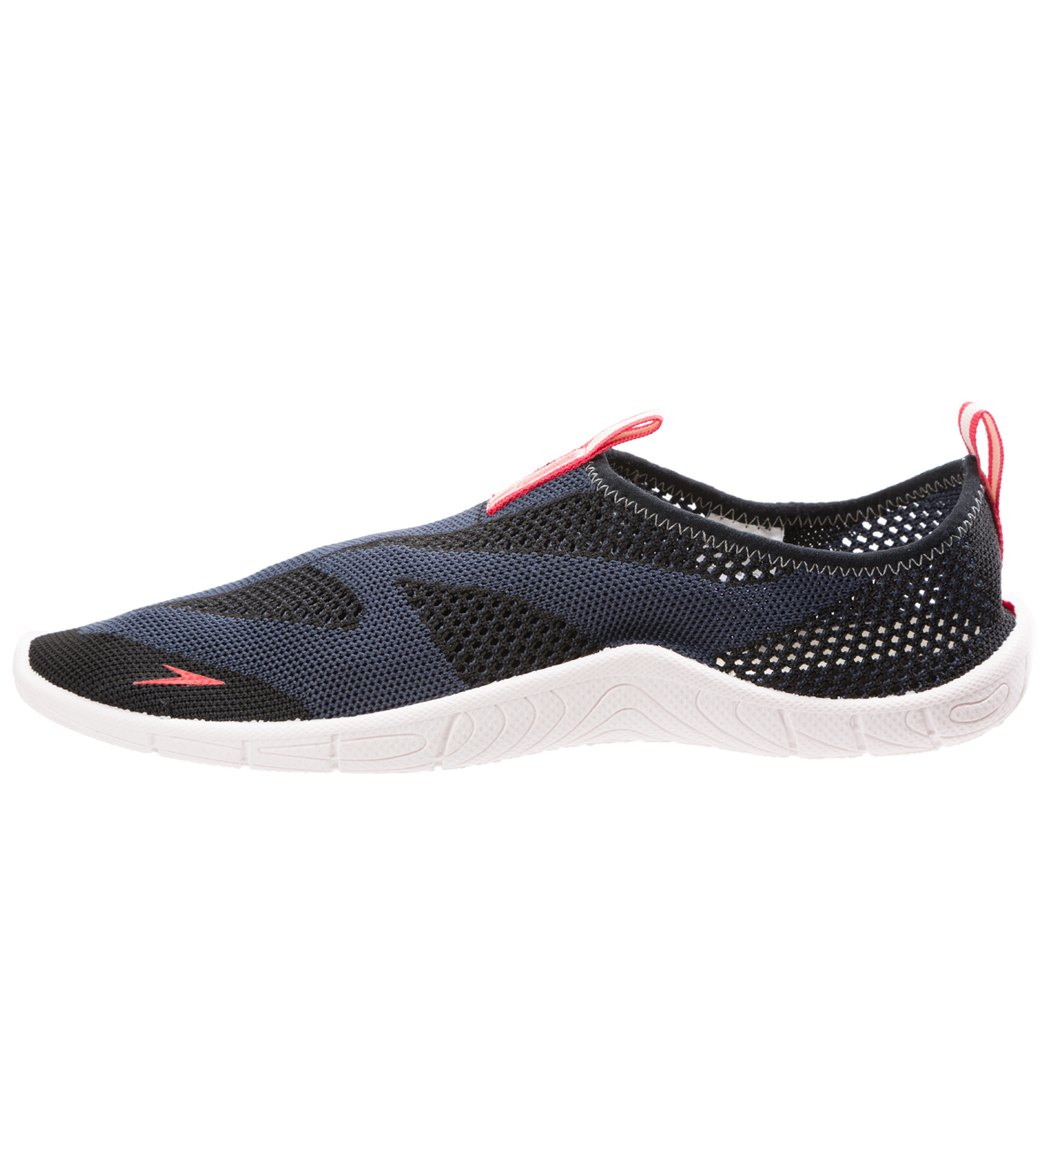 494640324325 Speedo Men s Surf Knit Water Shoe at SwimOutlet.com